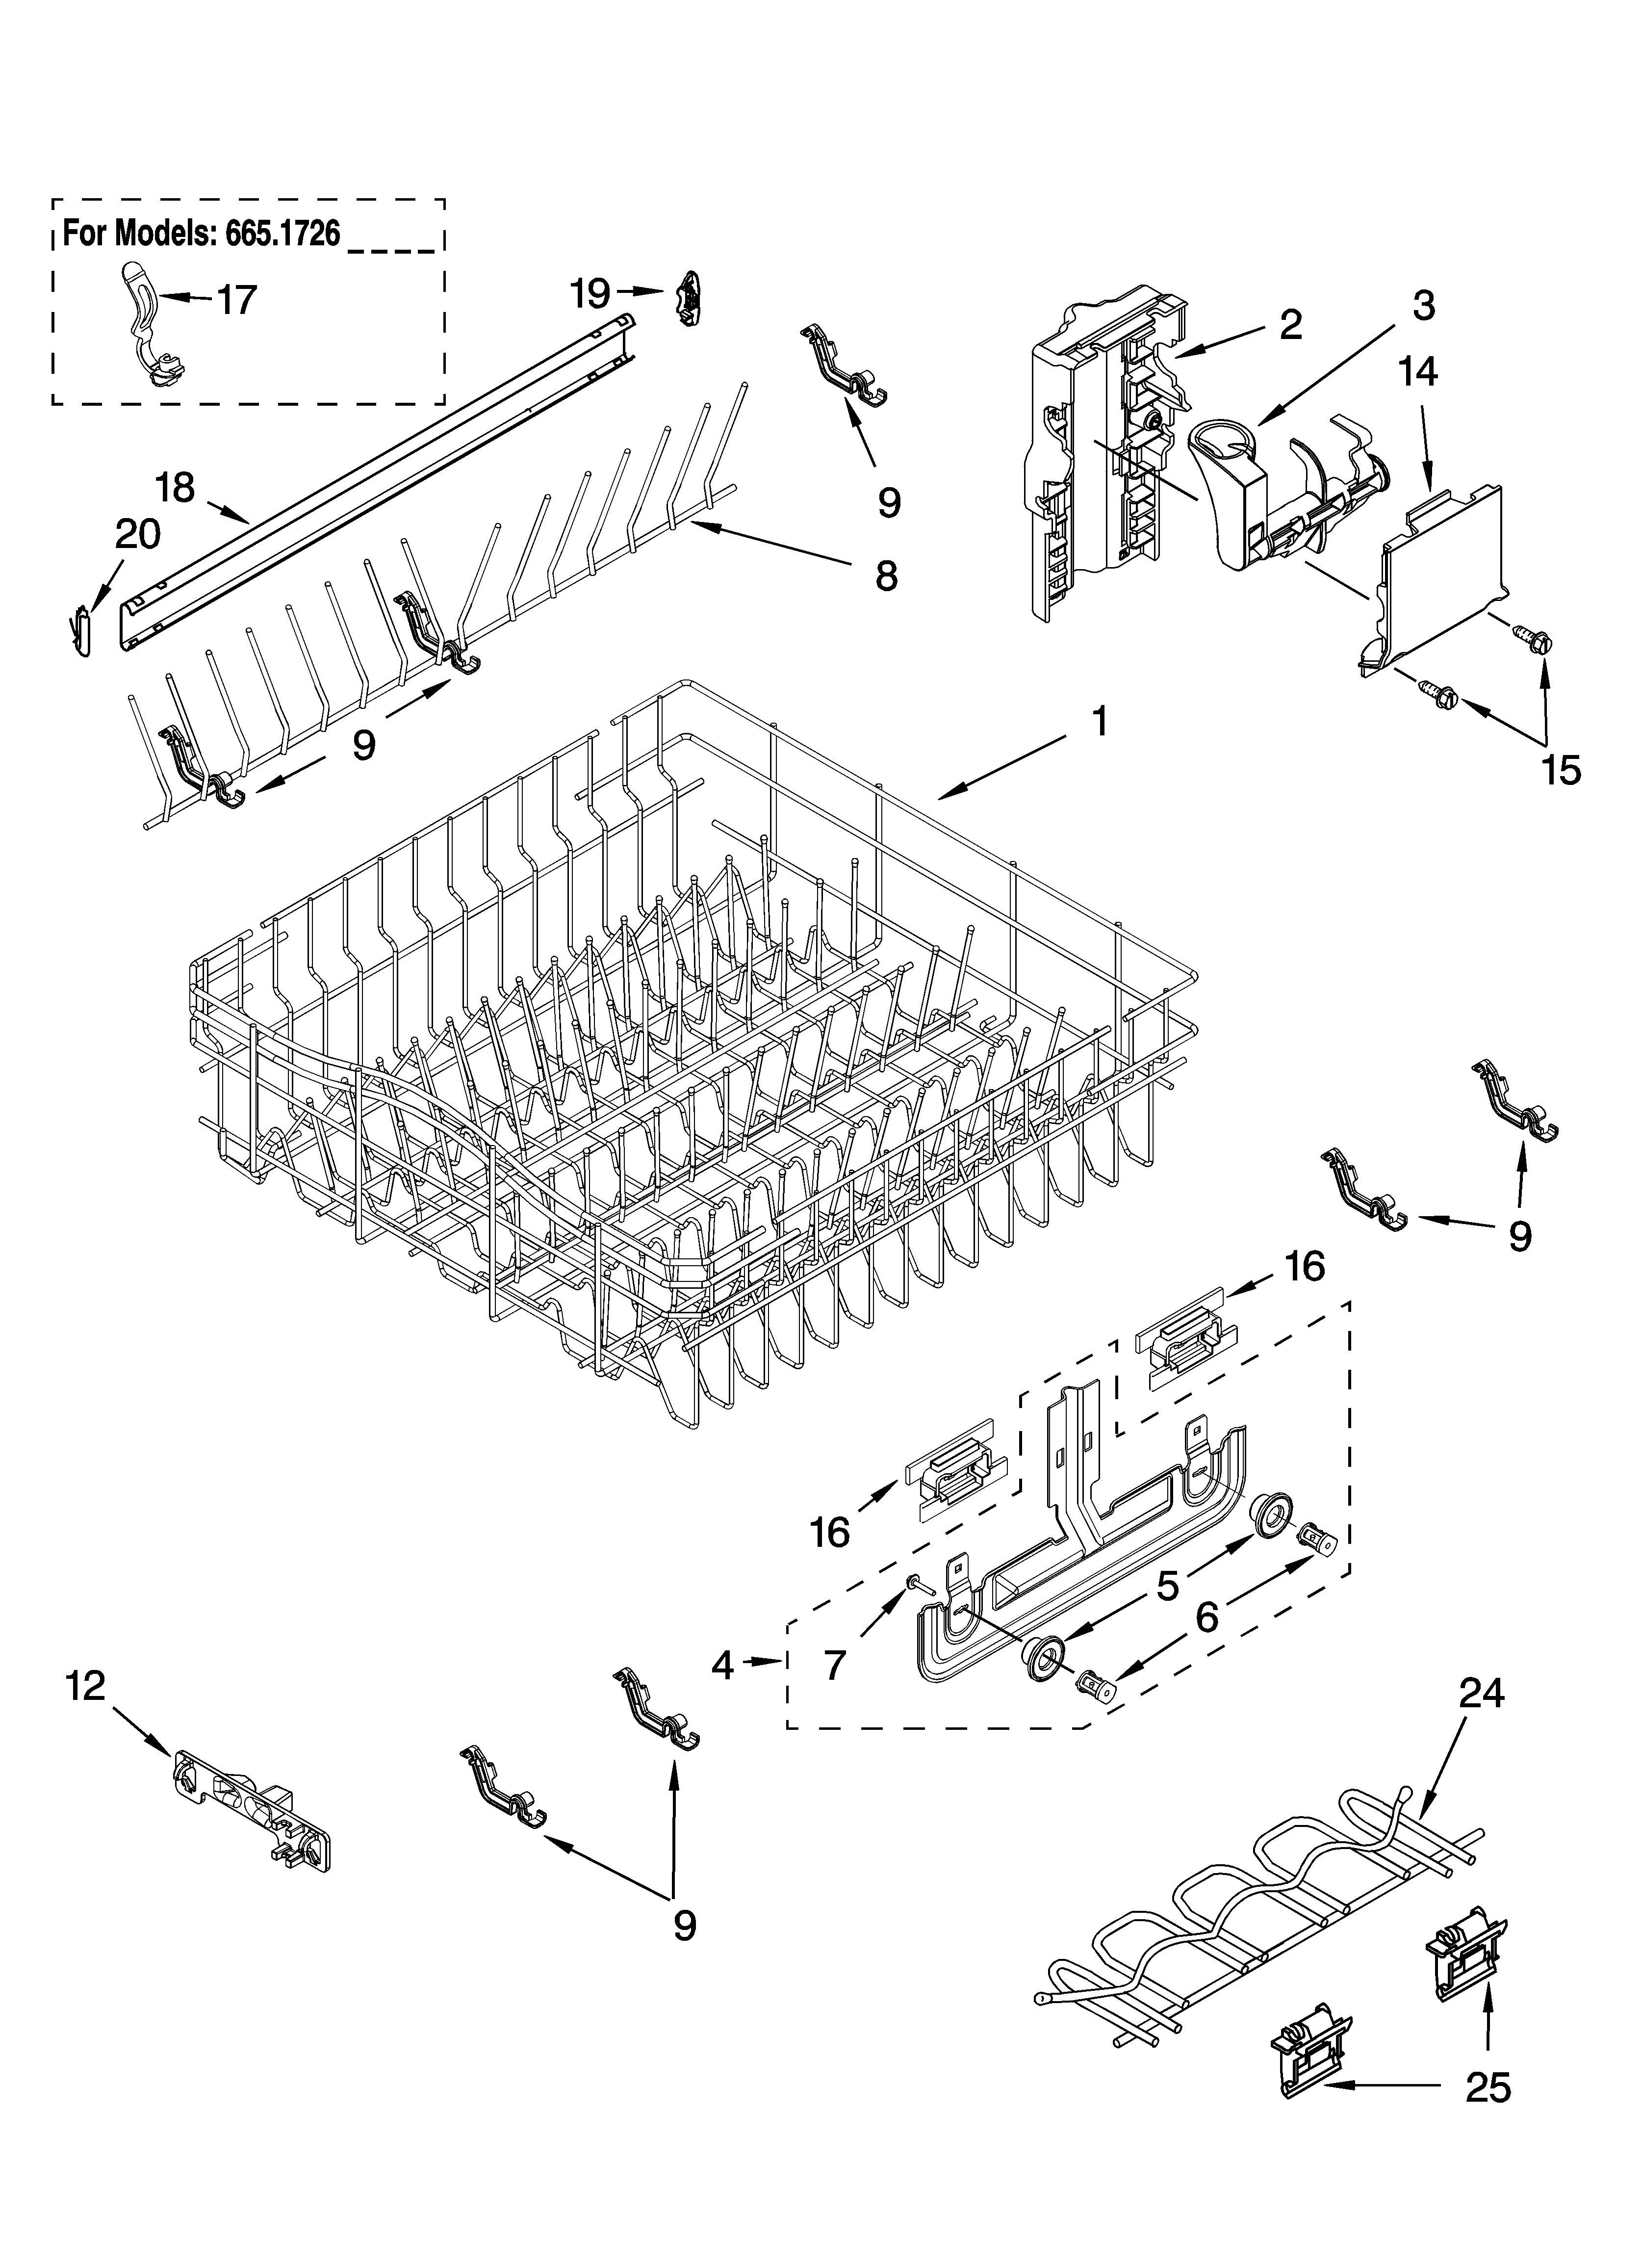 Kenmore Undercounter Dishwasher Model 8575285 It Has Been Making Parts Diagram List For 59677599802 Kenmoreeliteparts Graphic